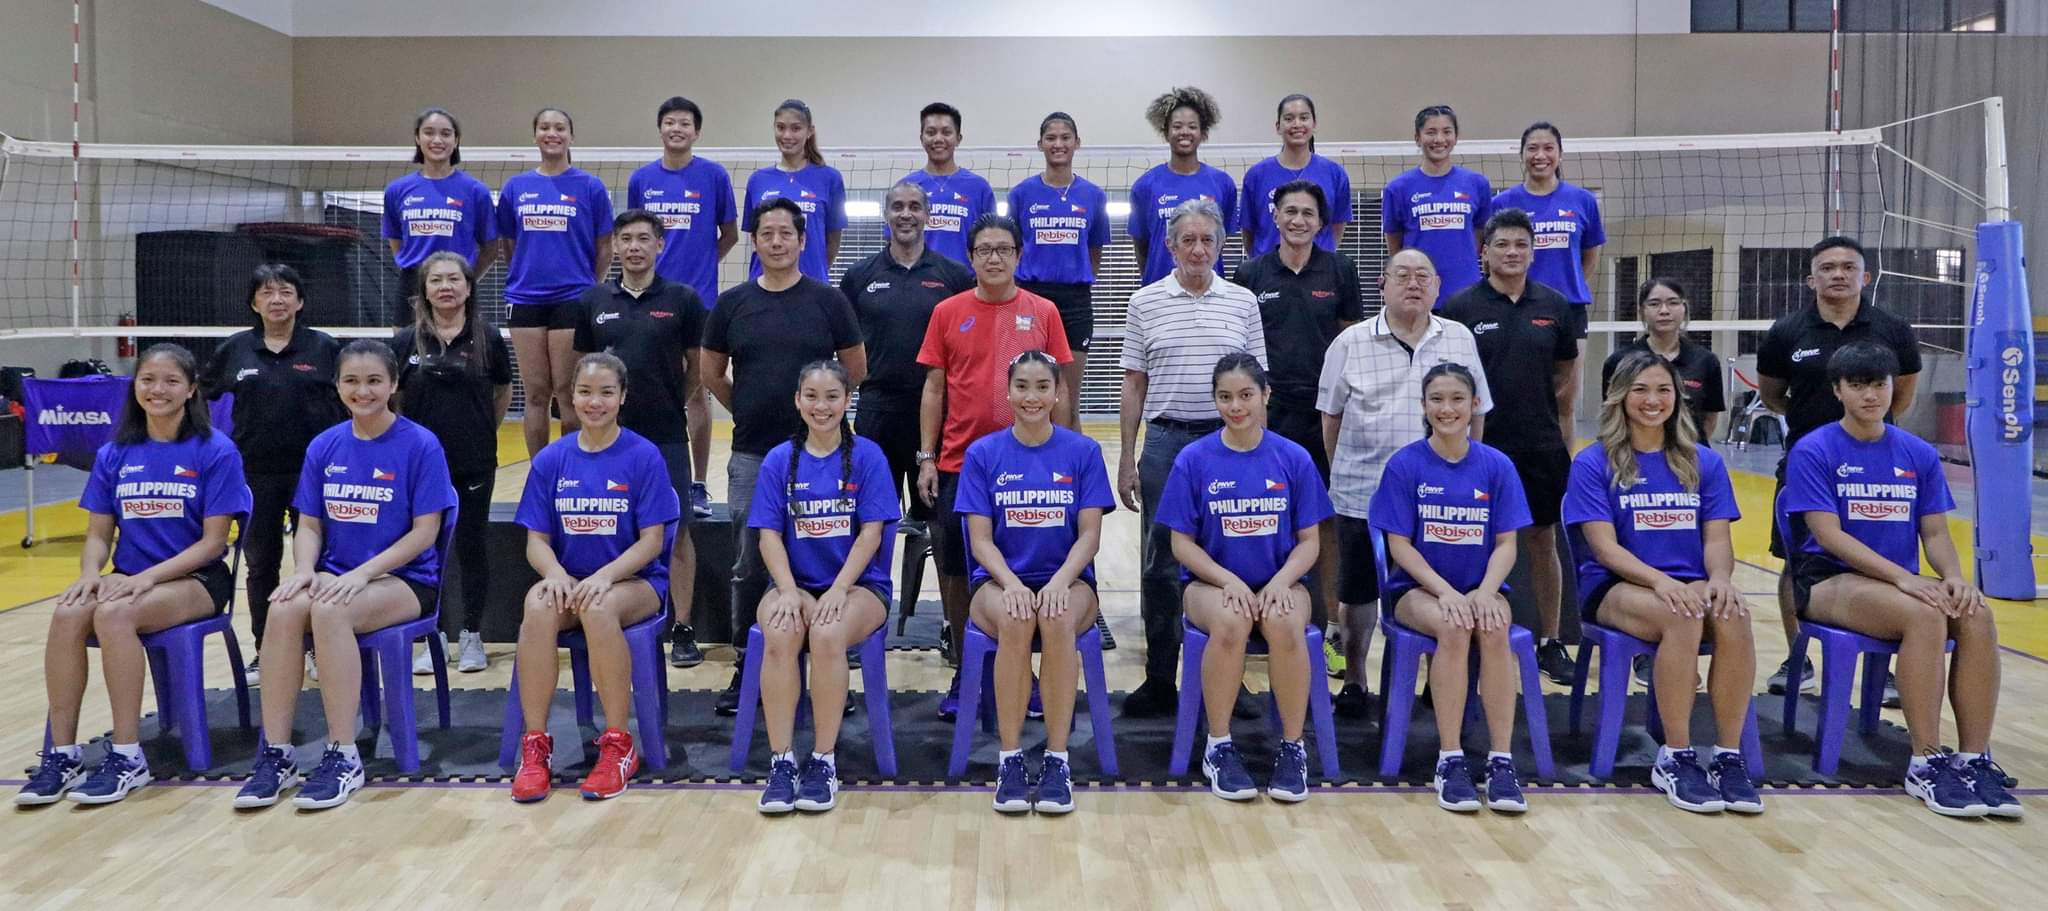 2021-AVC-Womens-Club-Championship-Rebisco-vs-Choco-Mucho-1 Marano, De Guzman captain Rebisco PH as Tolenada skippers Choco Mucho in AVC Club News Volleyball  - philippine sports news